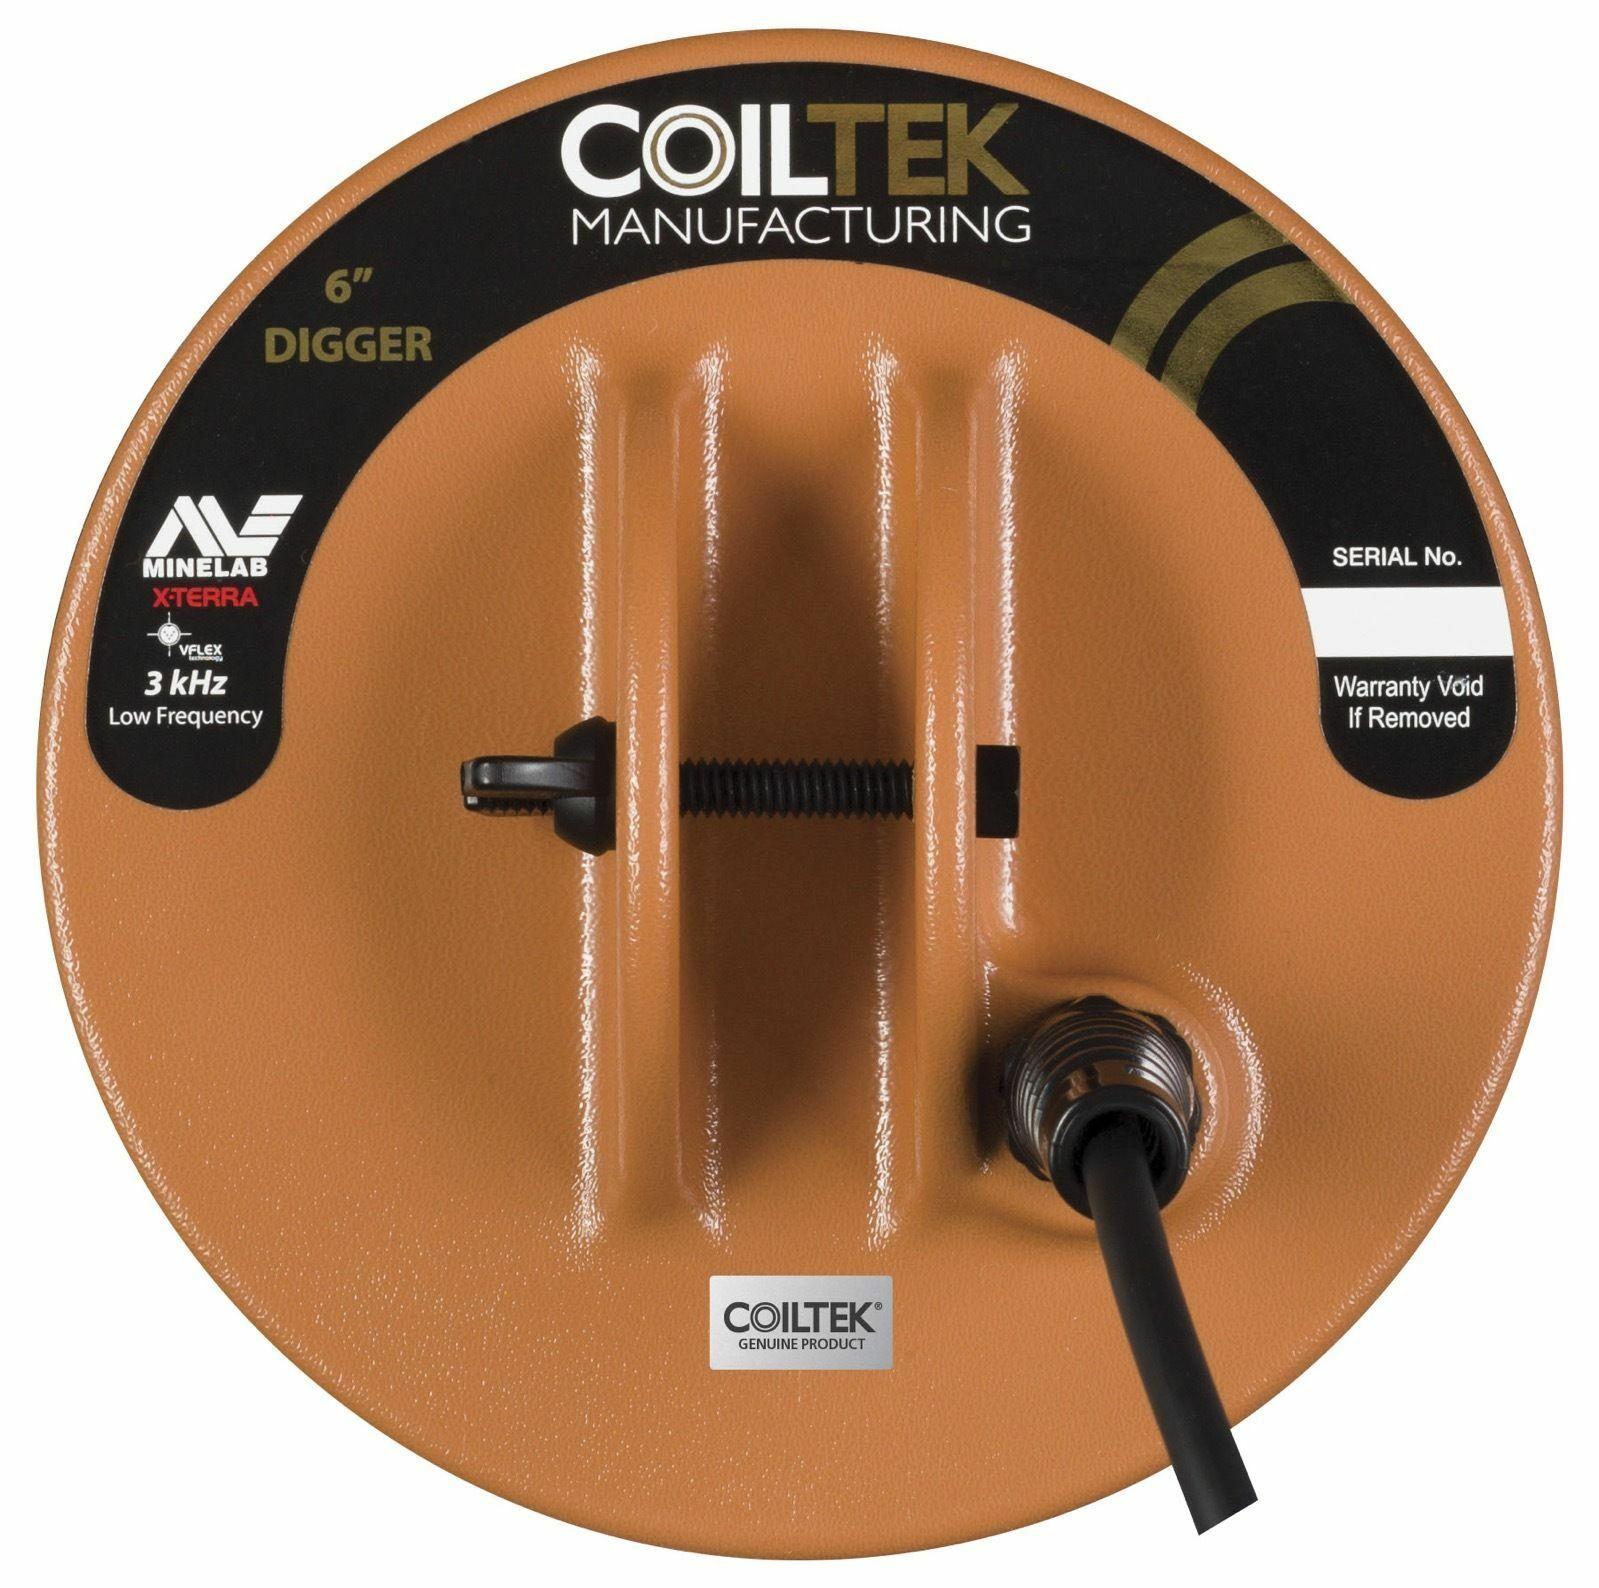 Катушка Coiltek 6 для серии X-Terra 3 кГц катушка minelab 9 mono m 7 5 кгц для x terra